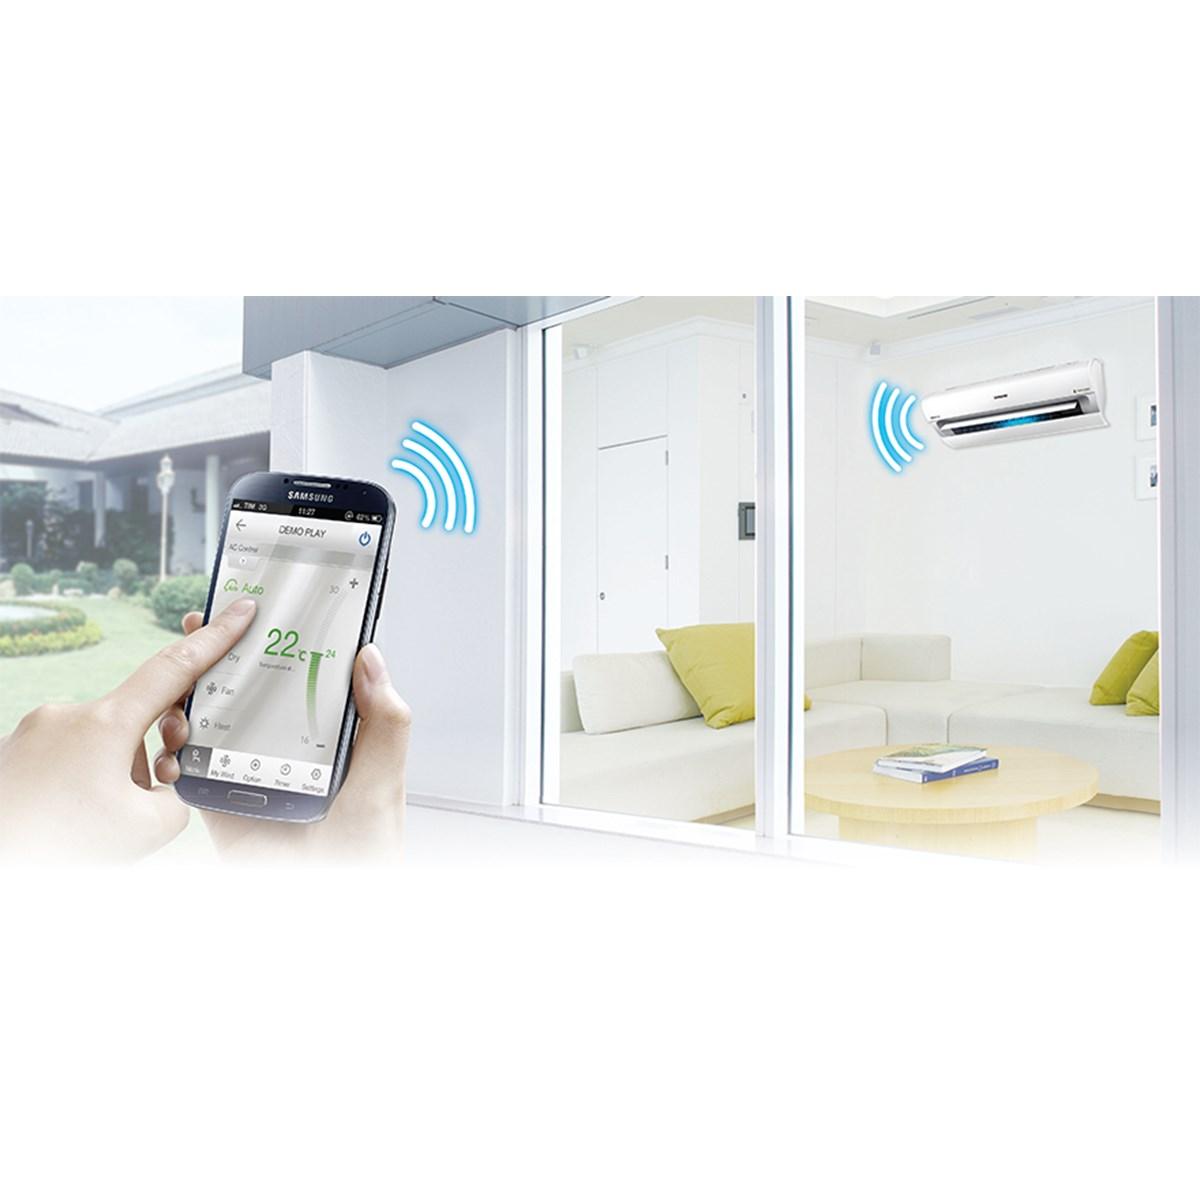 Samsung classic 2 5kw klimaanlage inverter w rmepumpe - Swing condizionatore ...